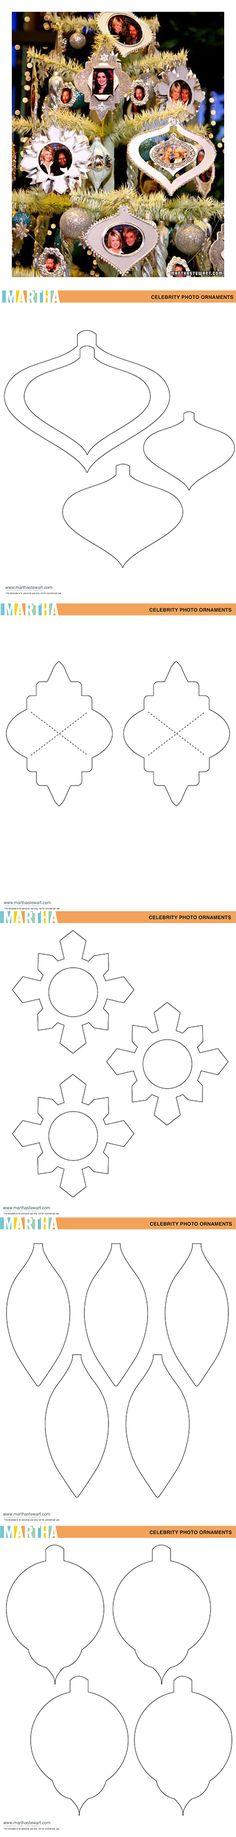 5 free ornament templates - Glittered paper frame ornaments - at Martha Stewart #Christmas #DIY